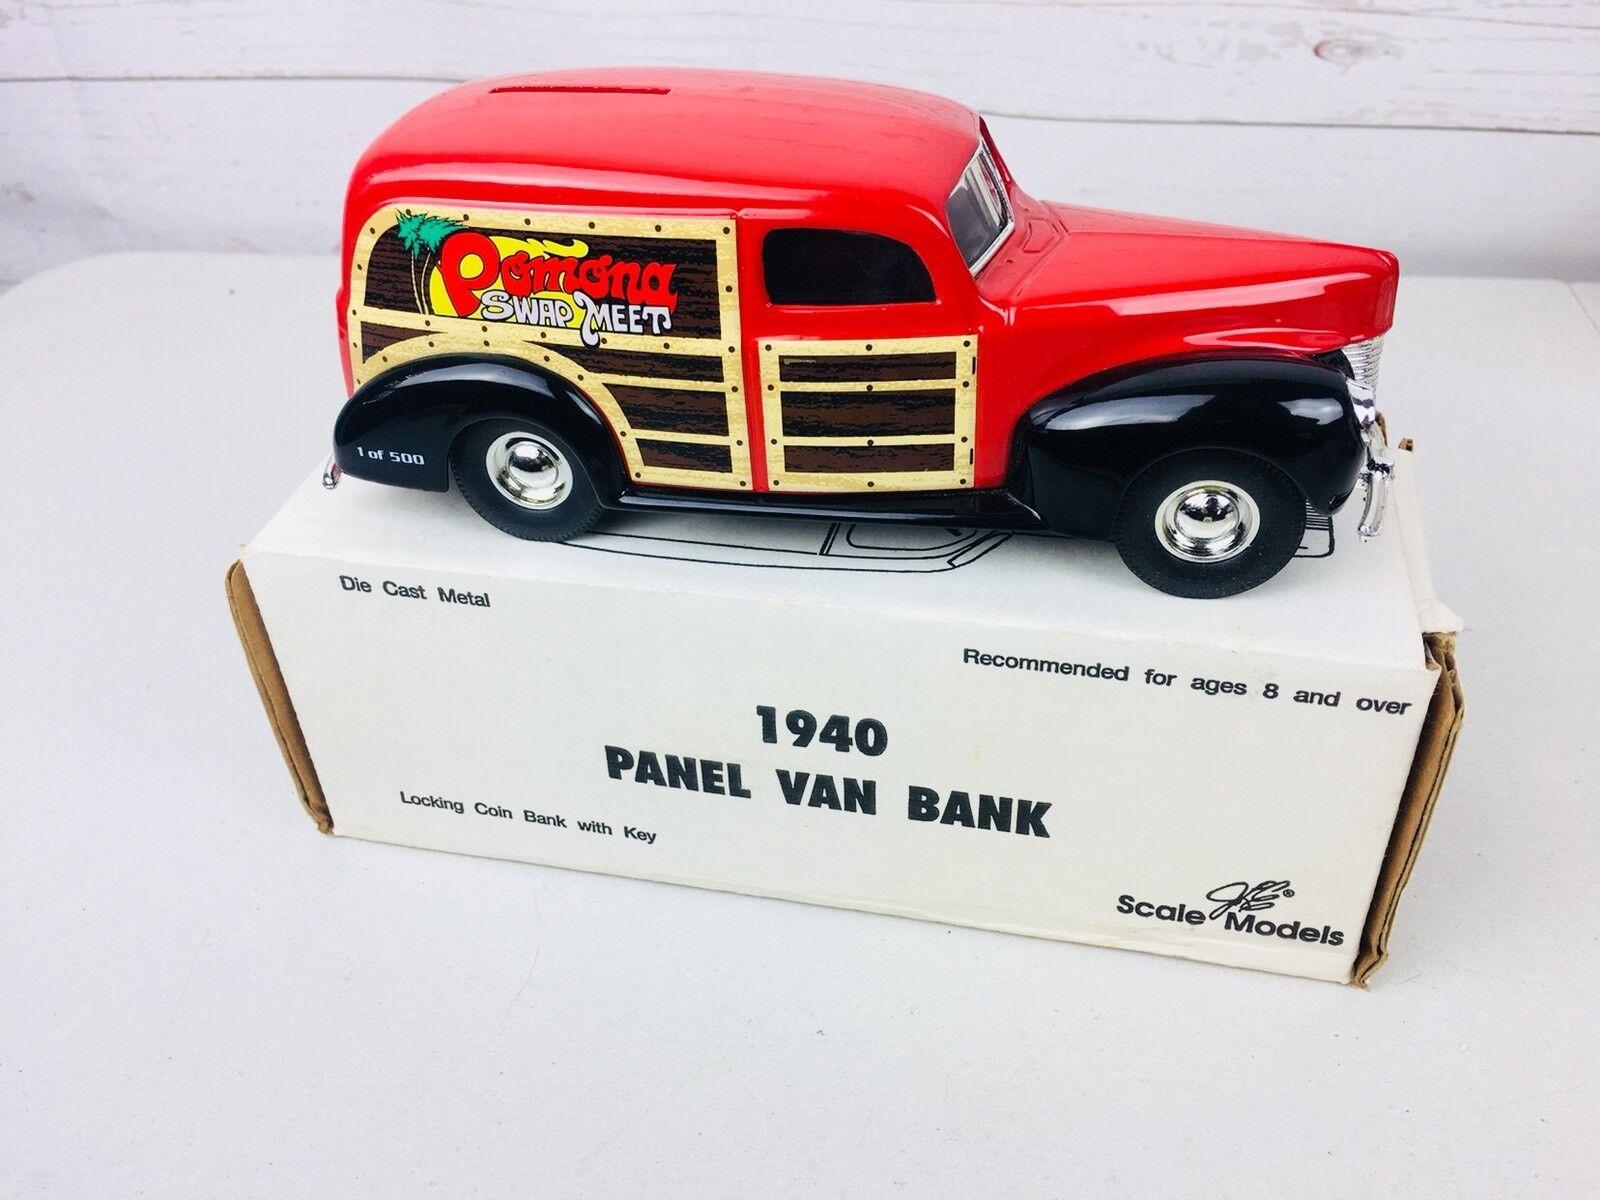 Ertl  GD6035 Pomona Swap Meet 1940 Delivery Van Die Cast metal Bank Made in USA